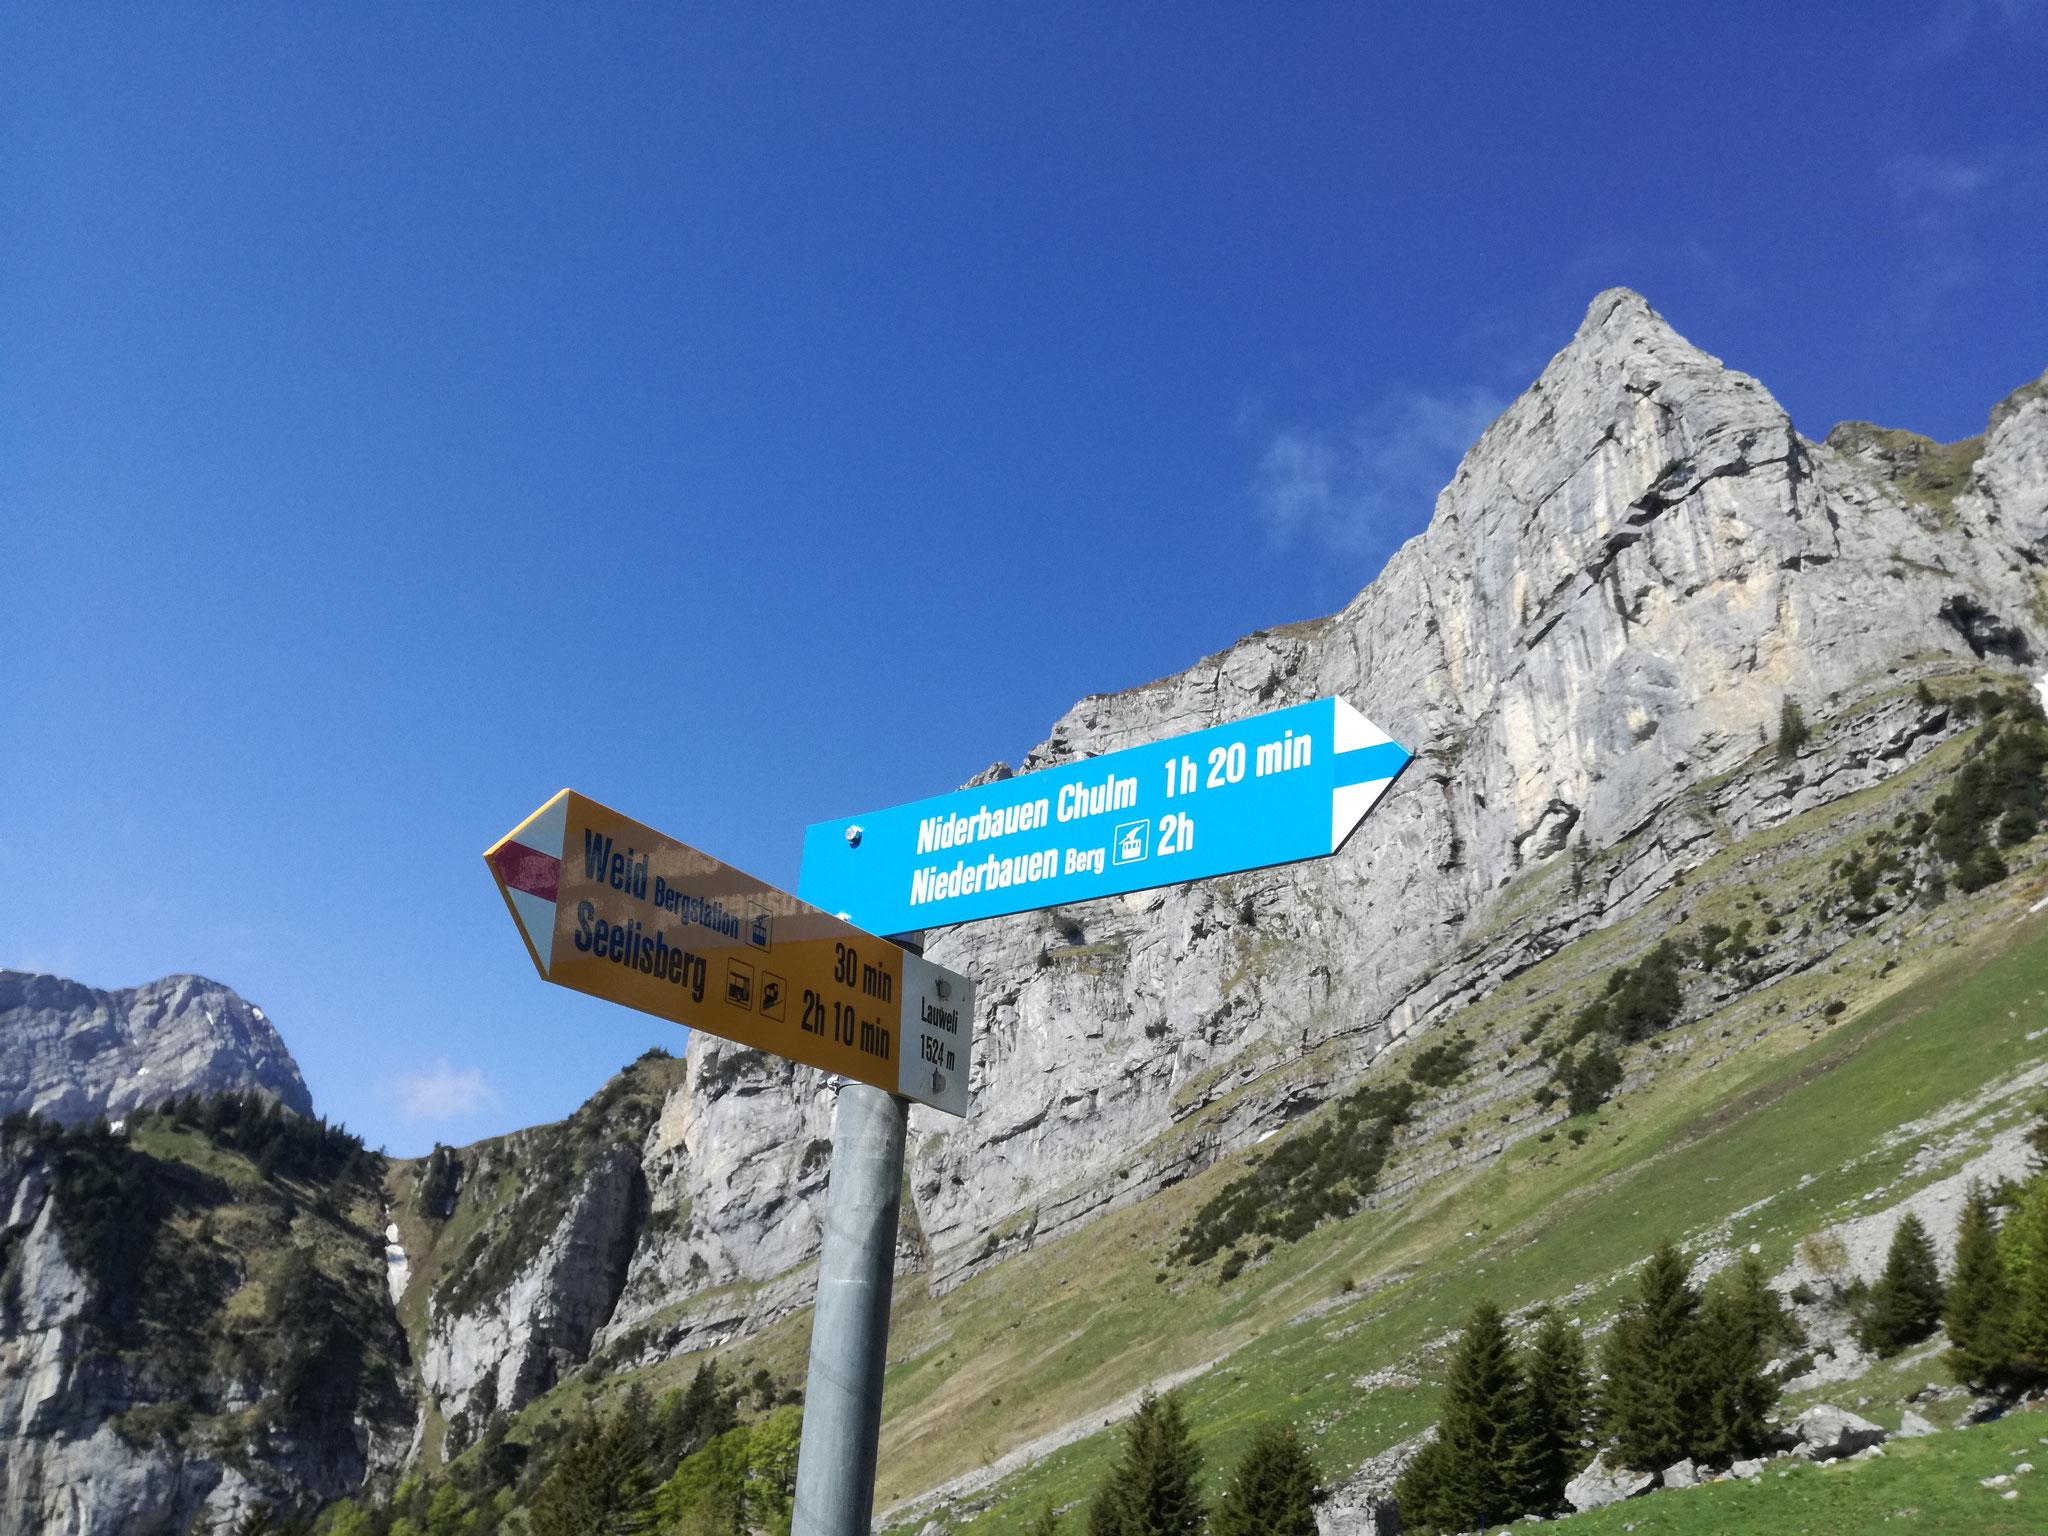 Wanderweg Richtung Chulm